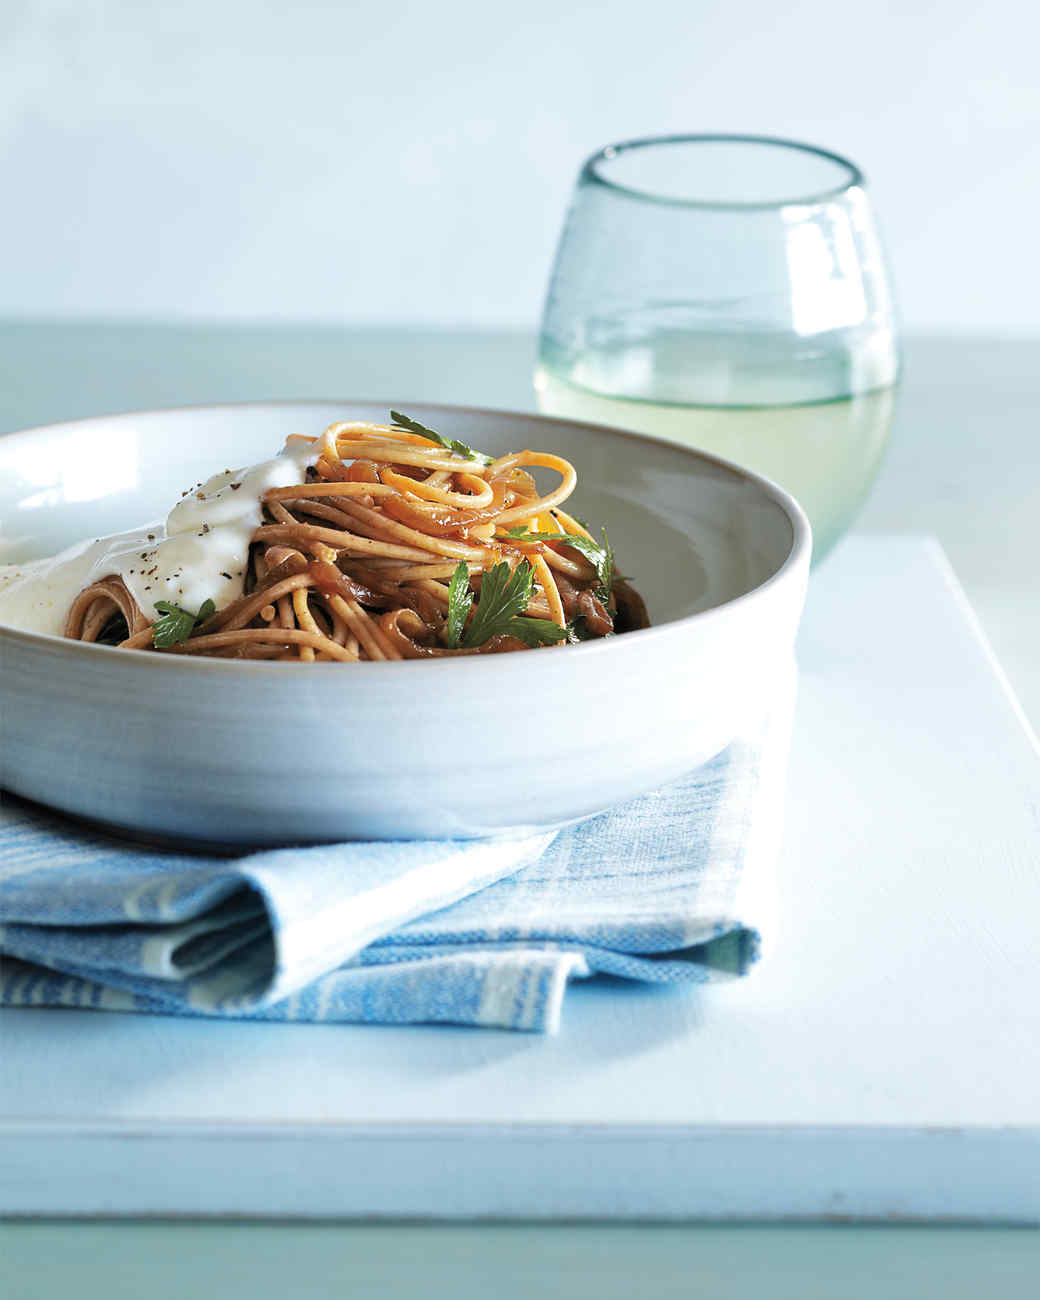 Spaghetti with Caramelized Onions and Yogurt